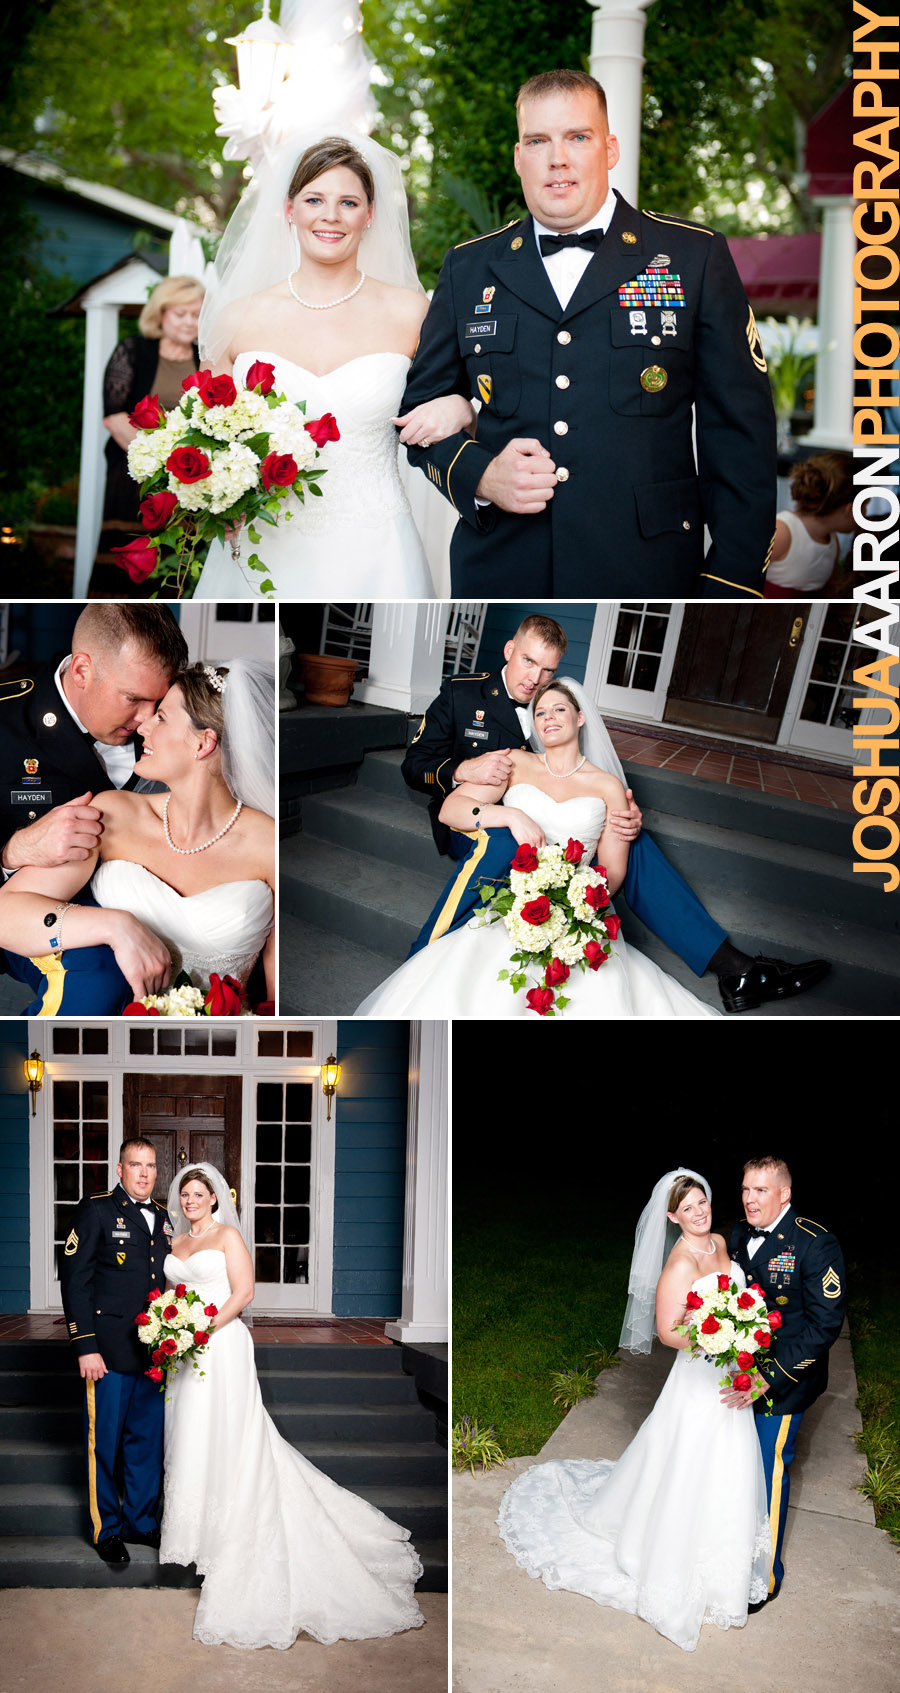 Amanda and Jason Wedding Reception at the Mitchell House